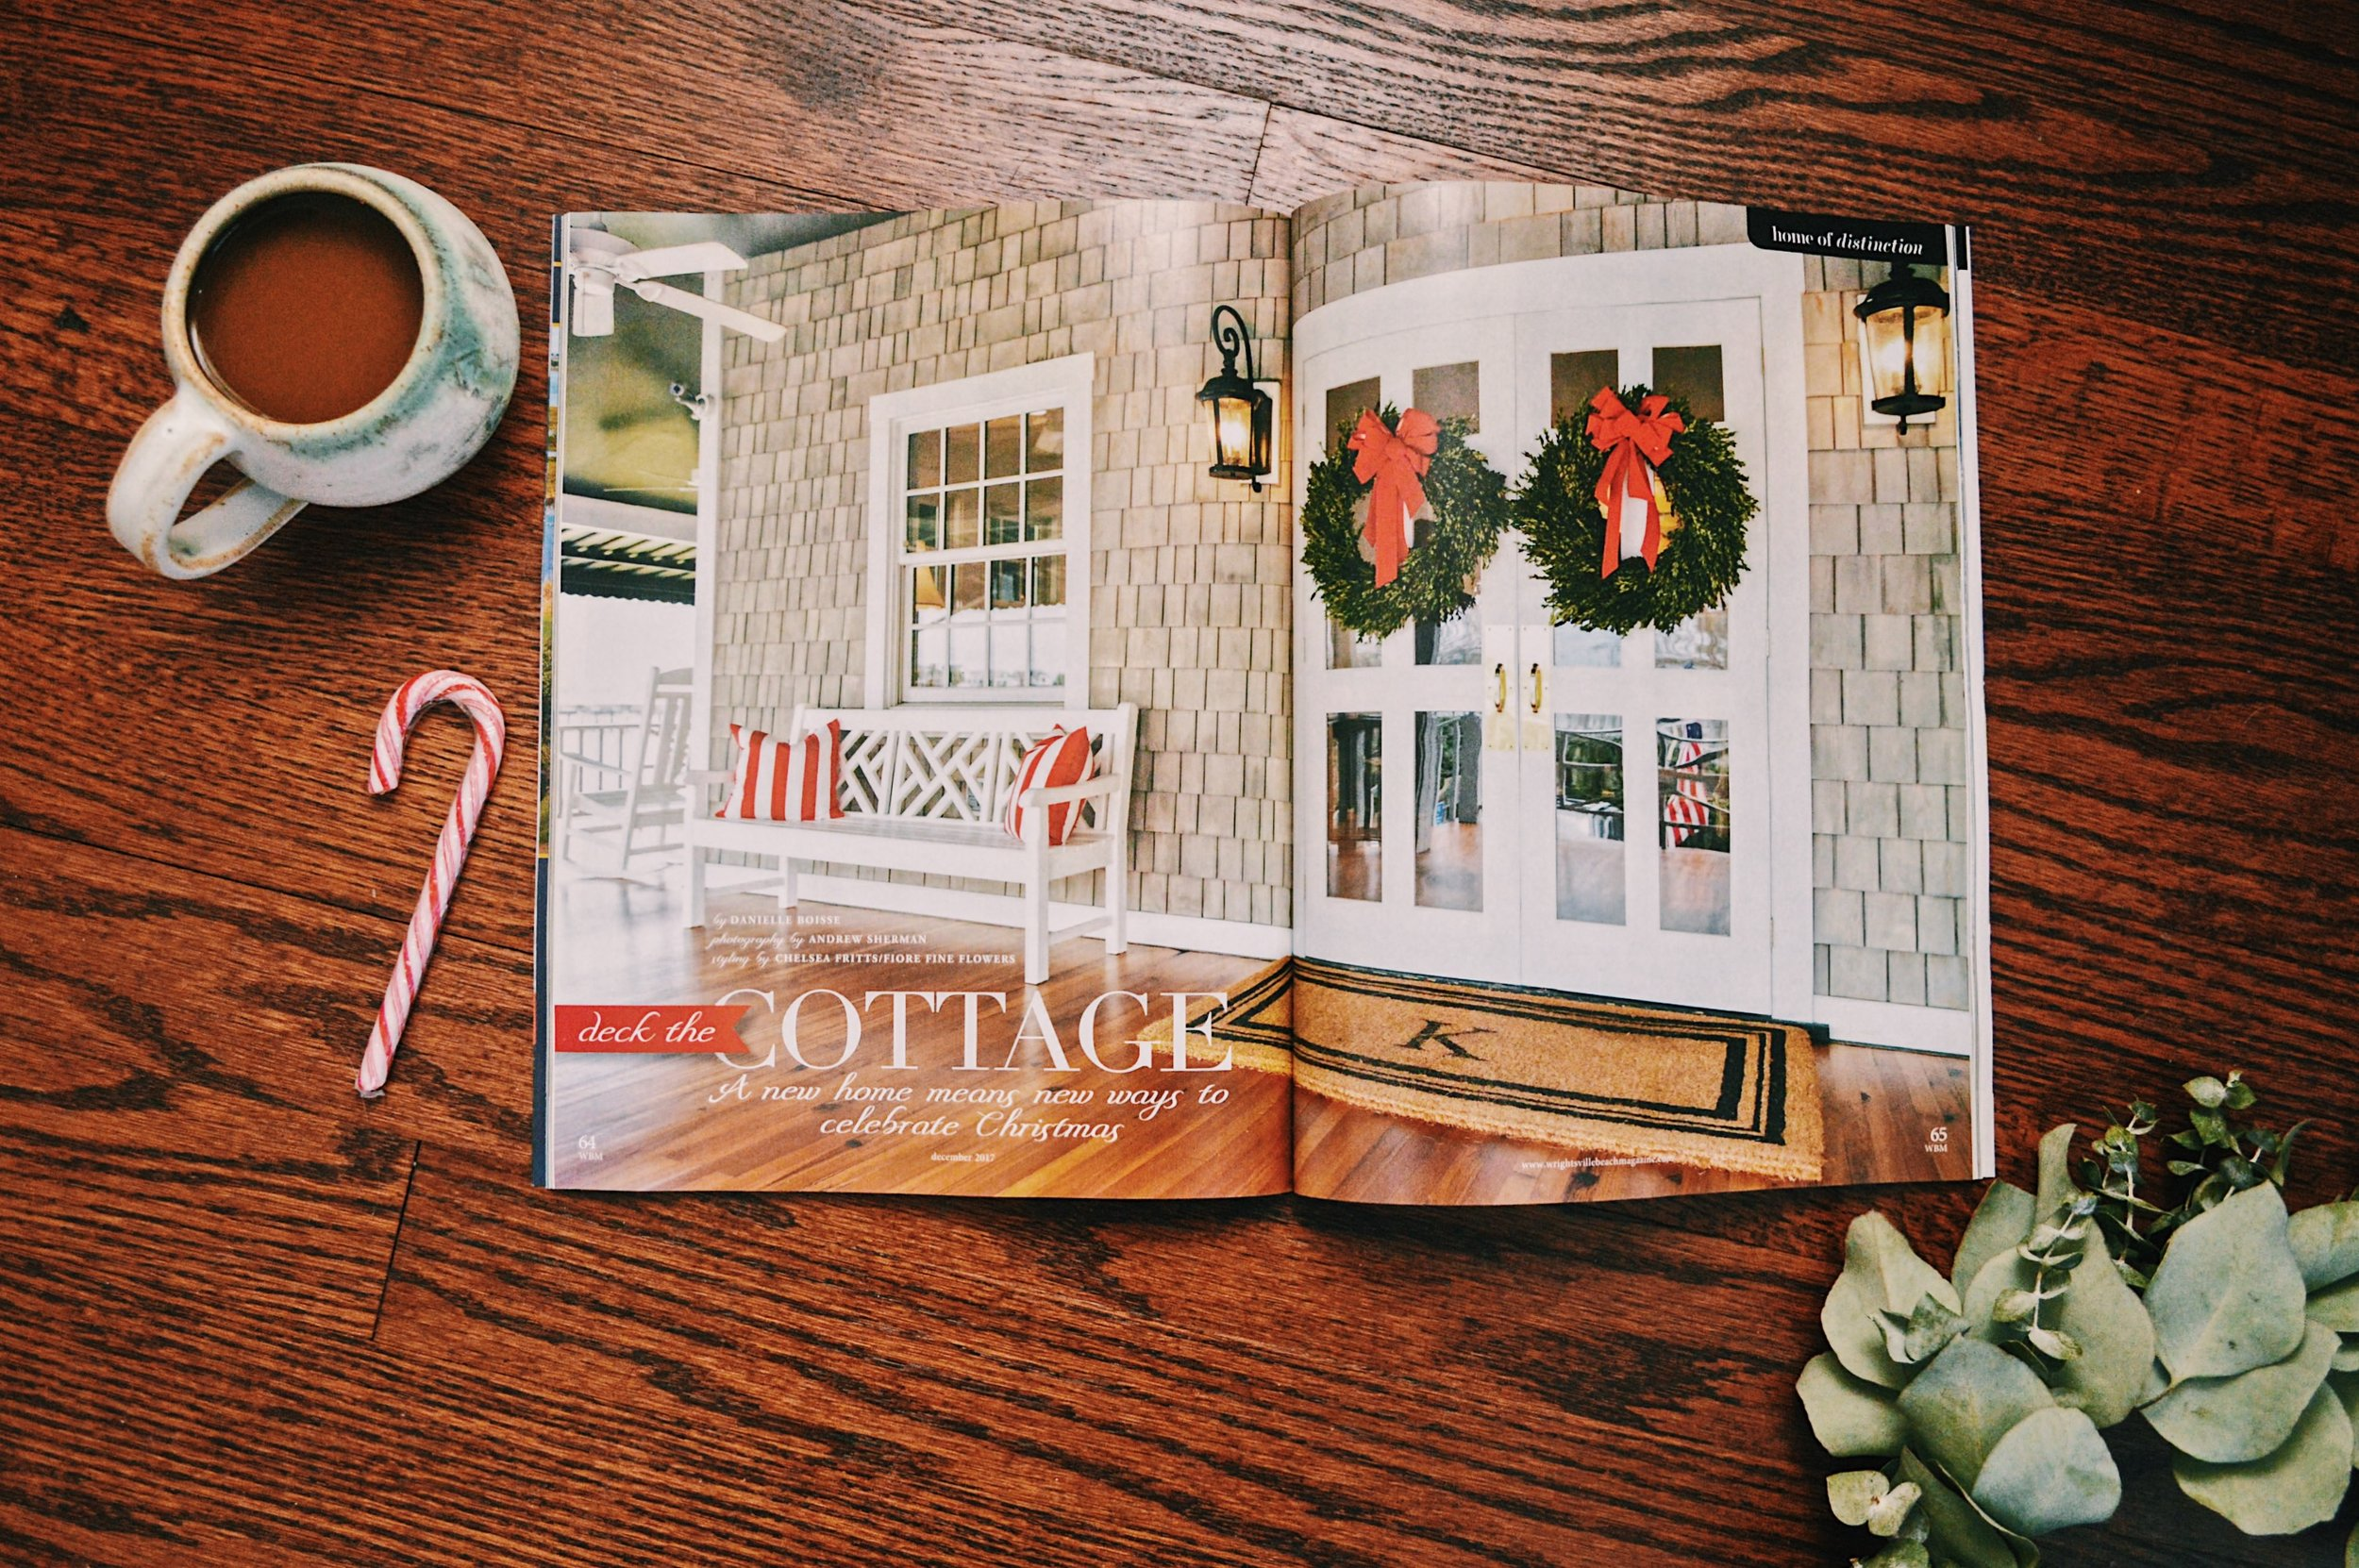 wrightsville beach magazine home of distinction schmidt custom builders.JPG